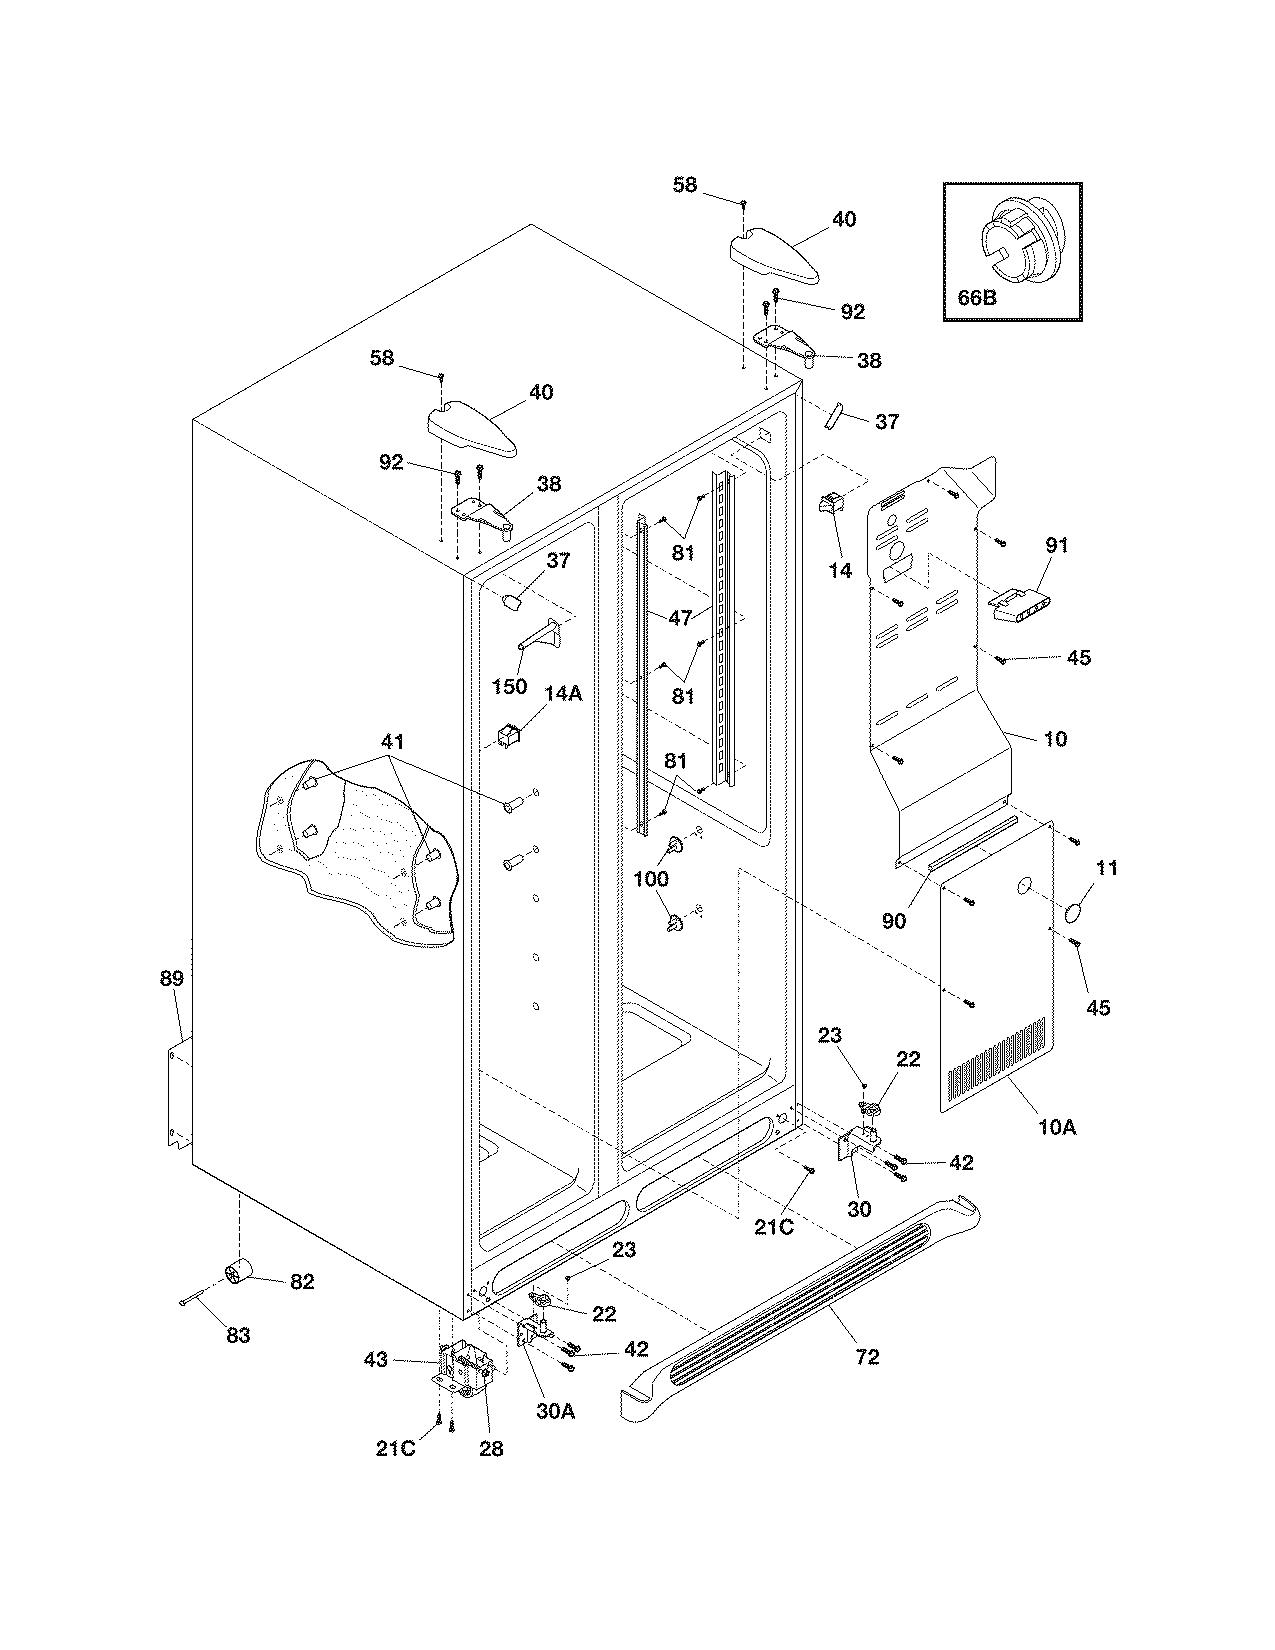 FRIGIDAIRE Refrigerator Ice & water dispenser Parts